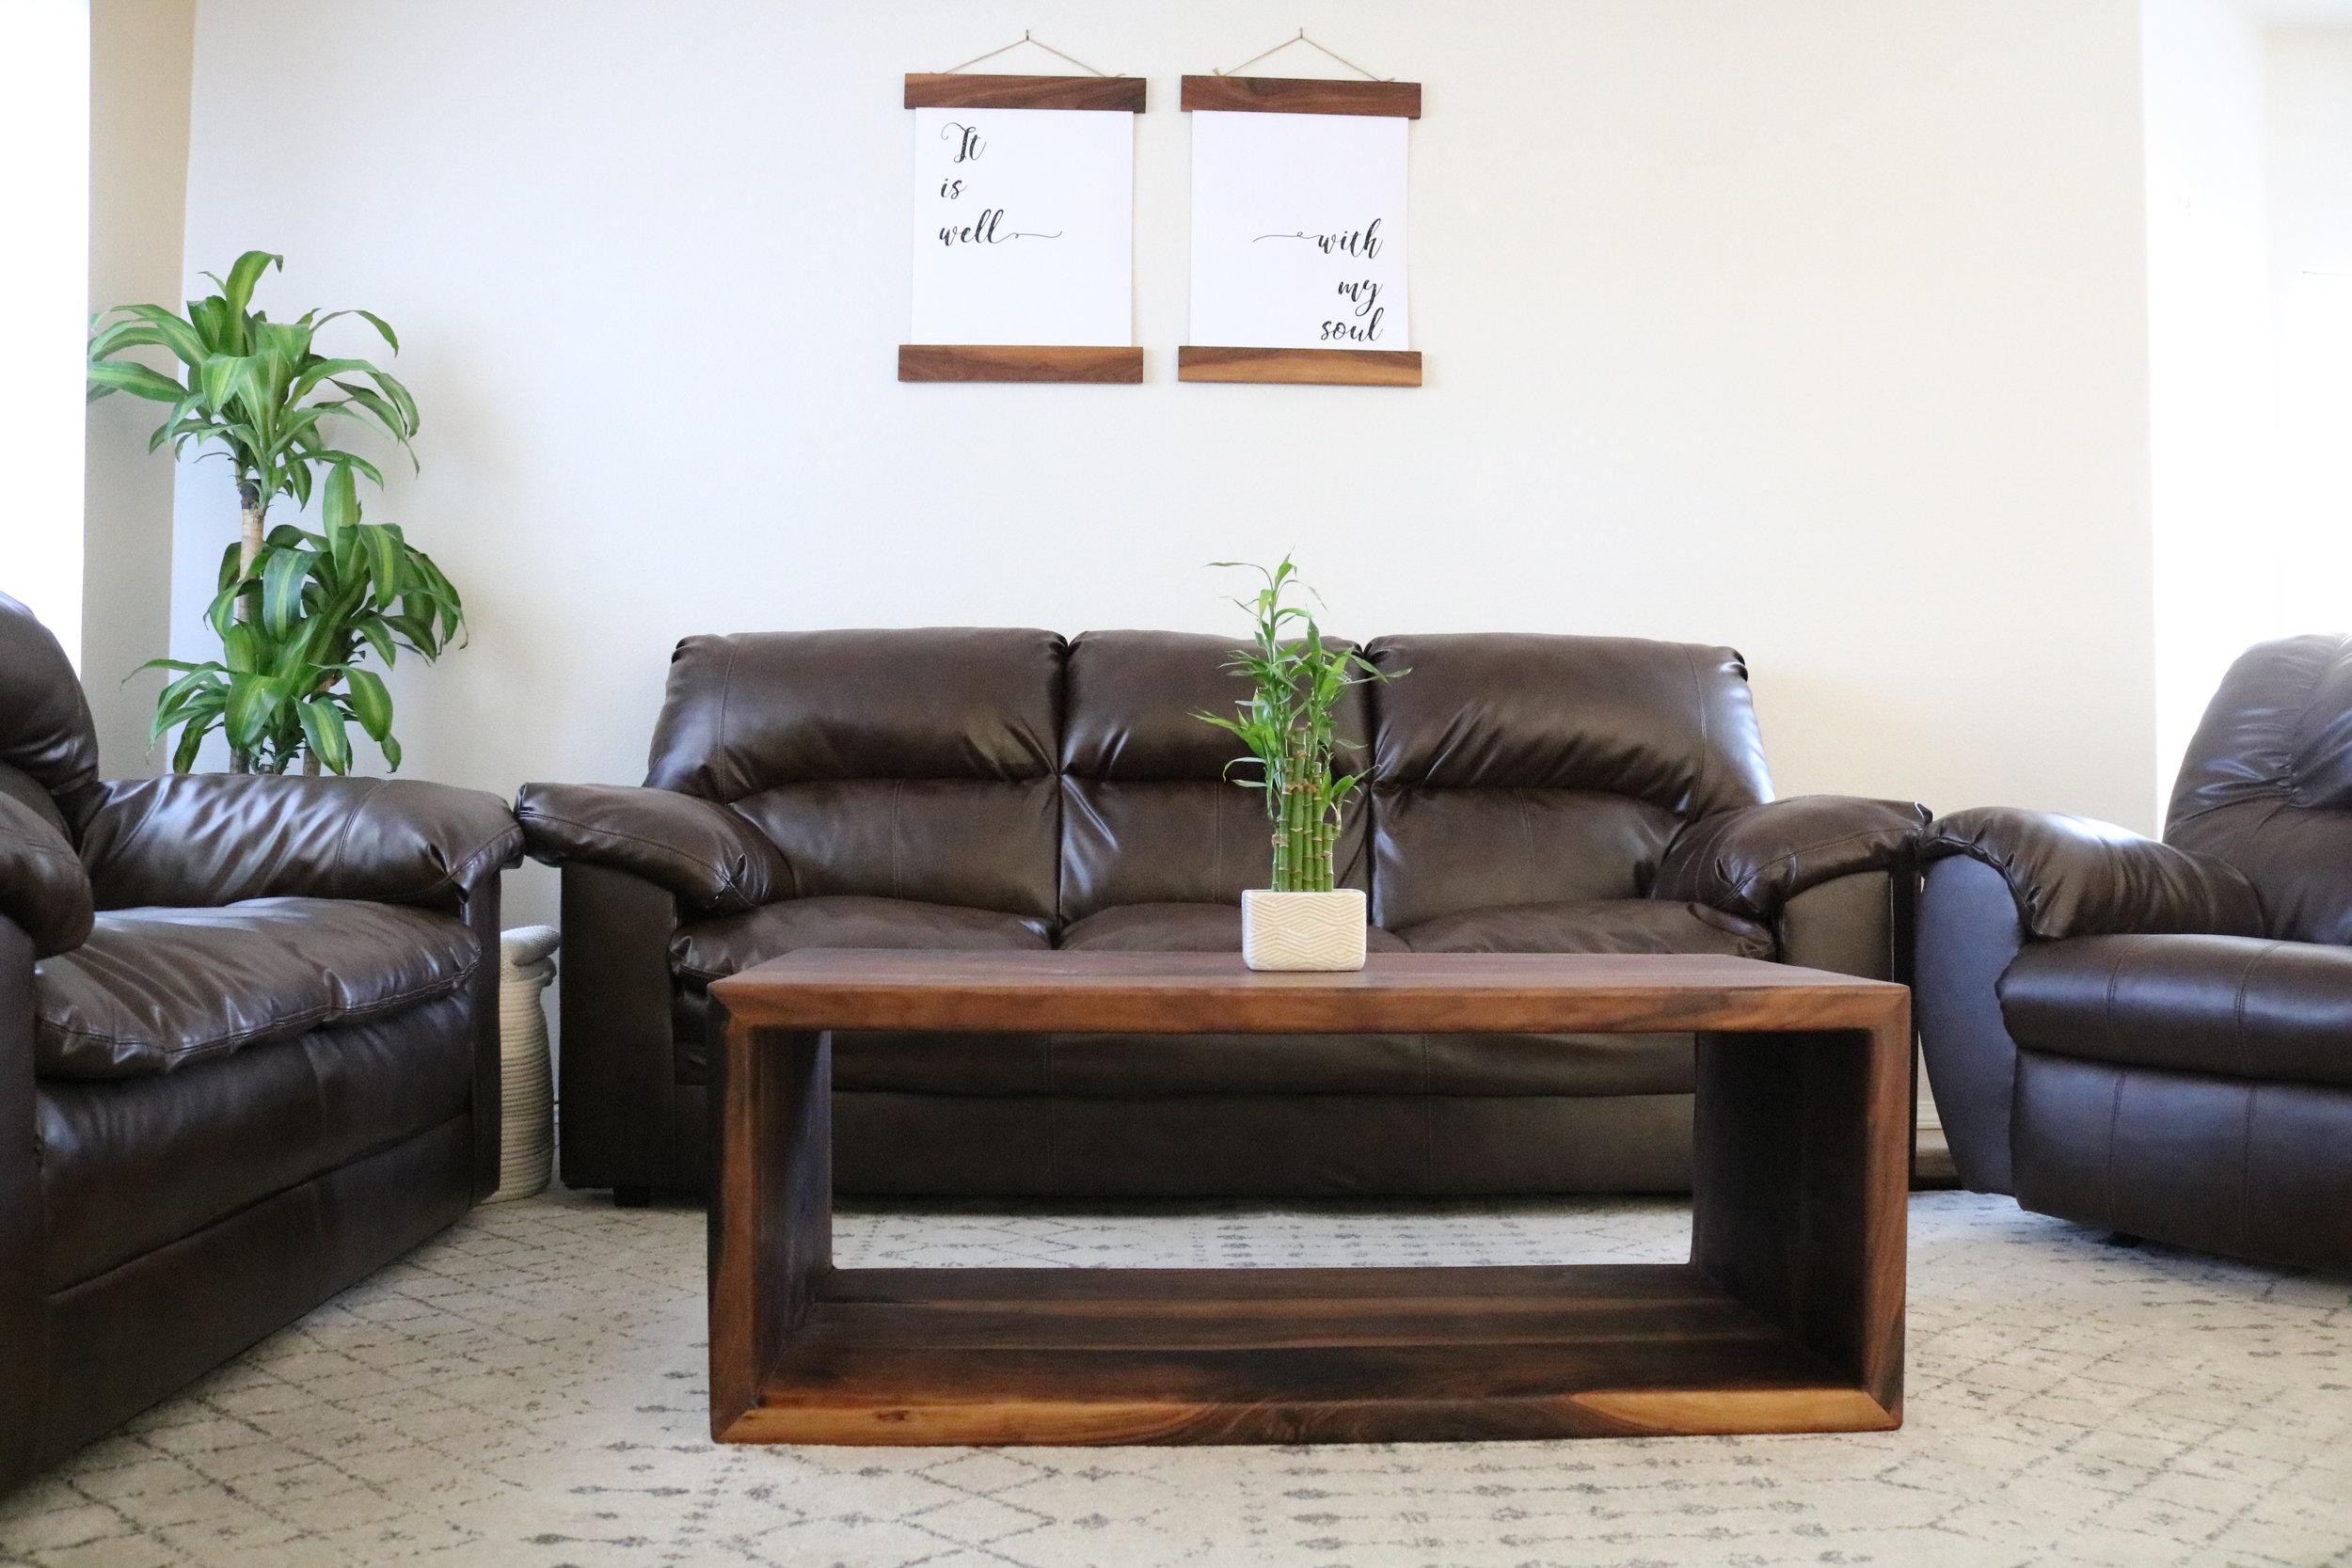 walnut-coffee-table-boise-idaho-furniture.JPG